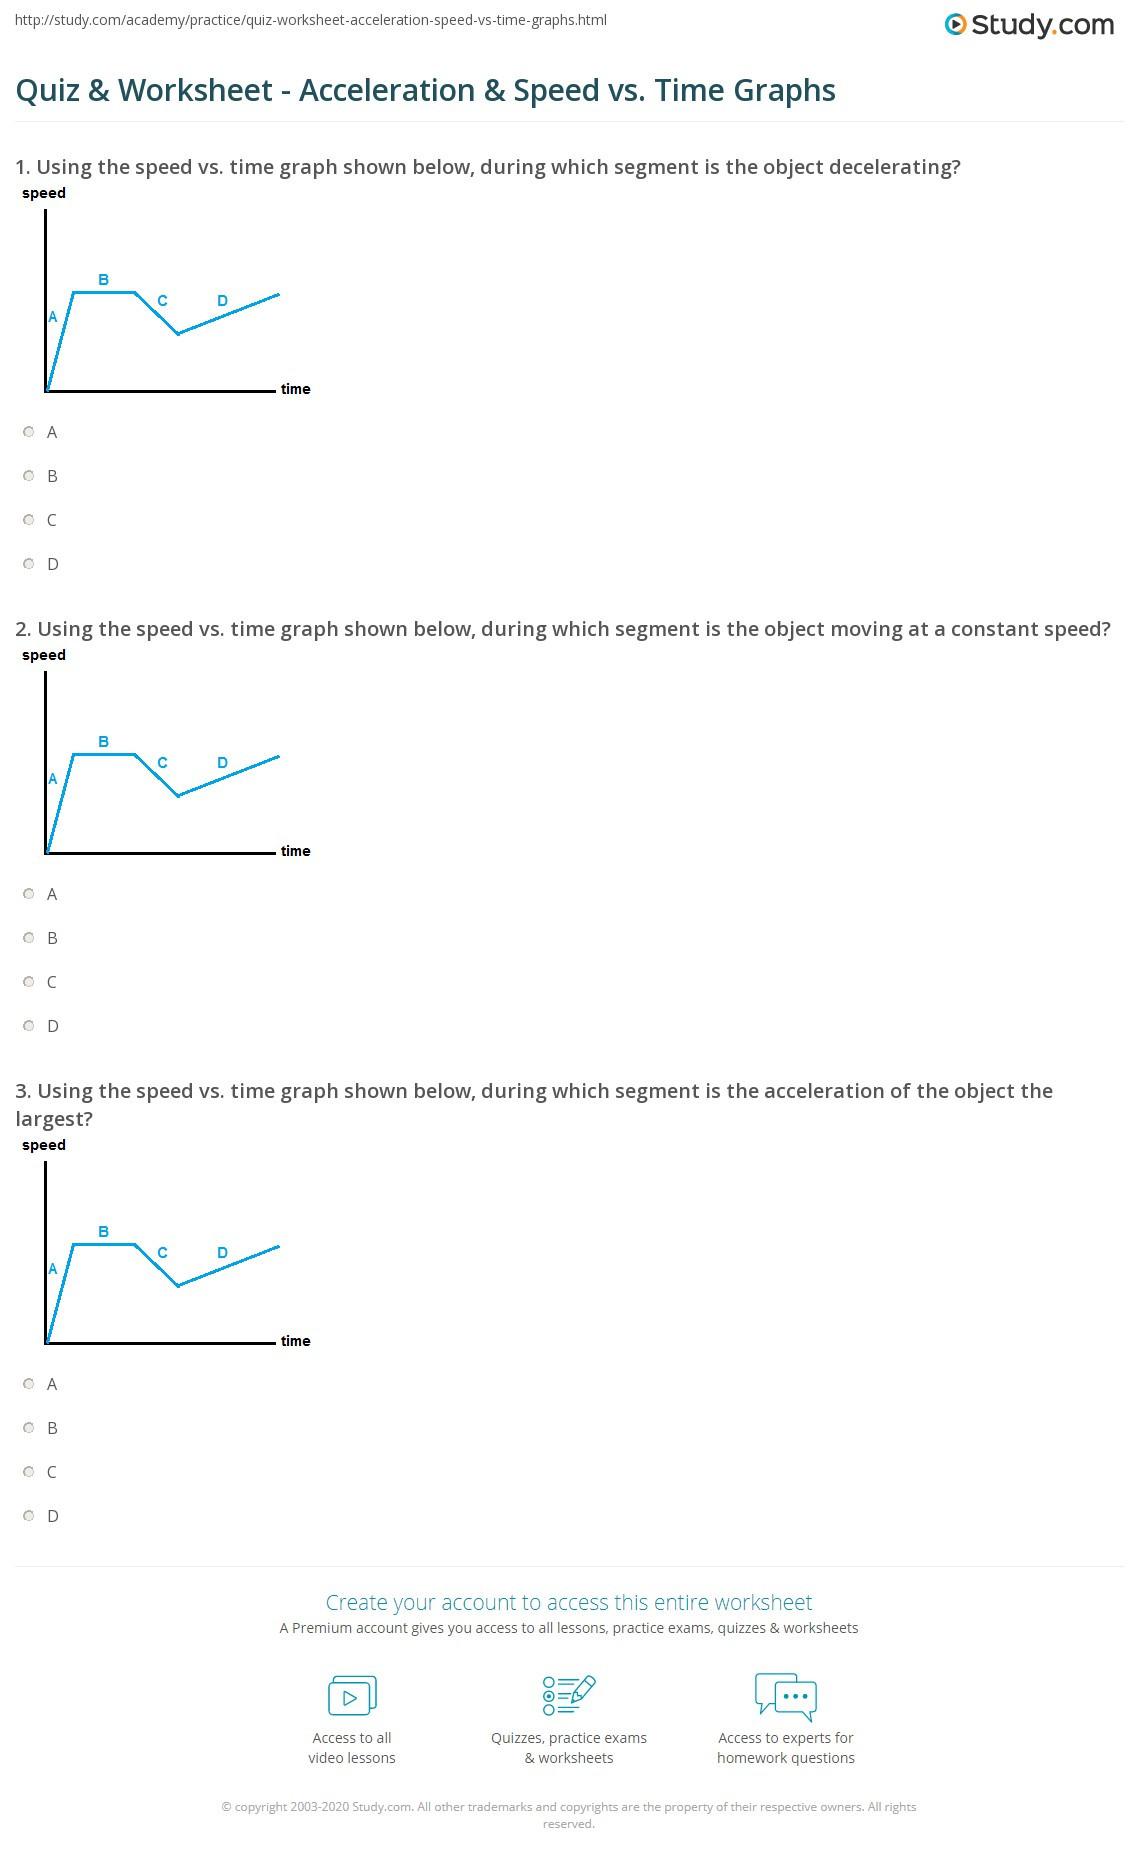 Quiz & Worksheet Acceleration & Speed vs Time Graphs